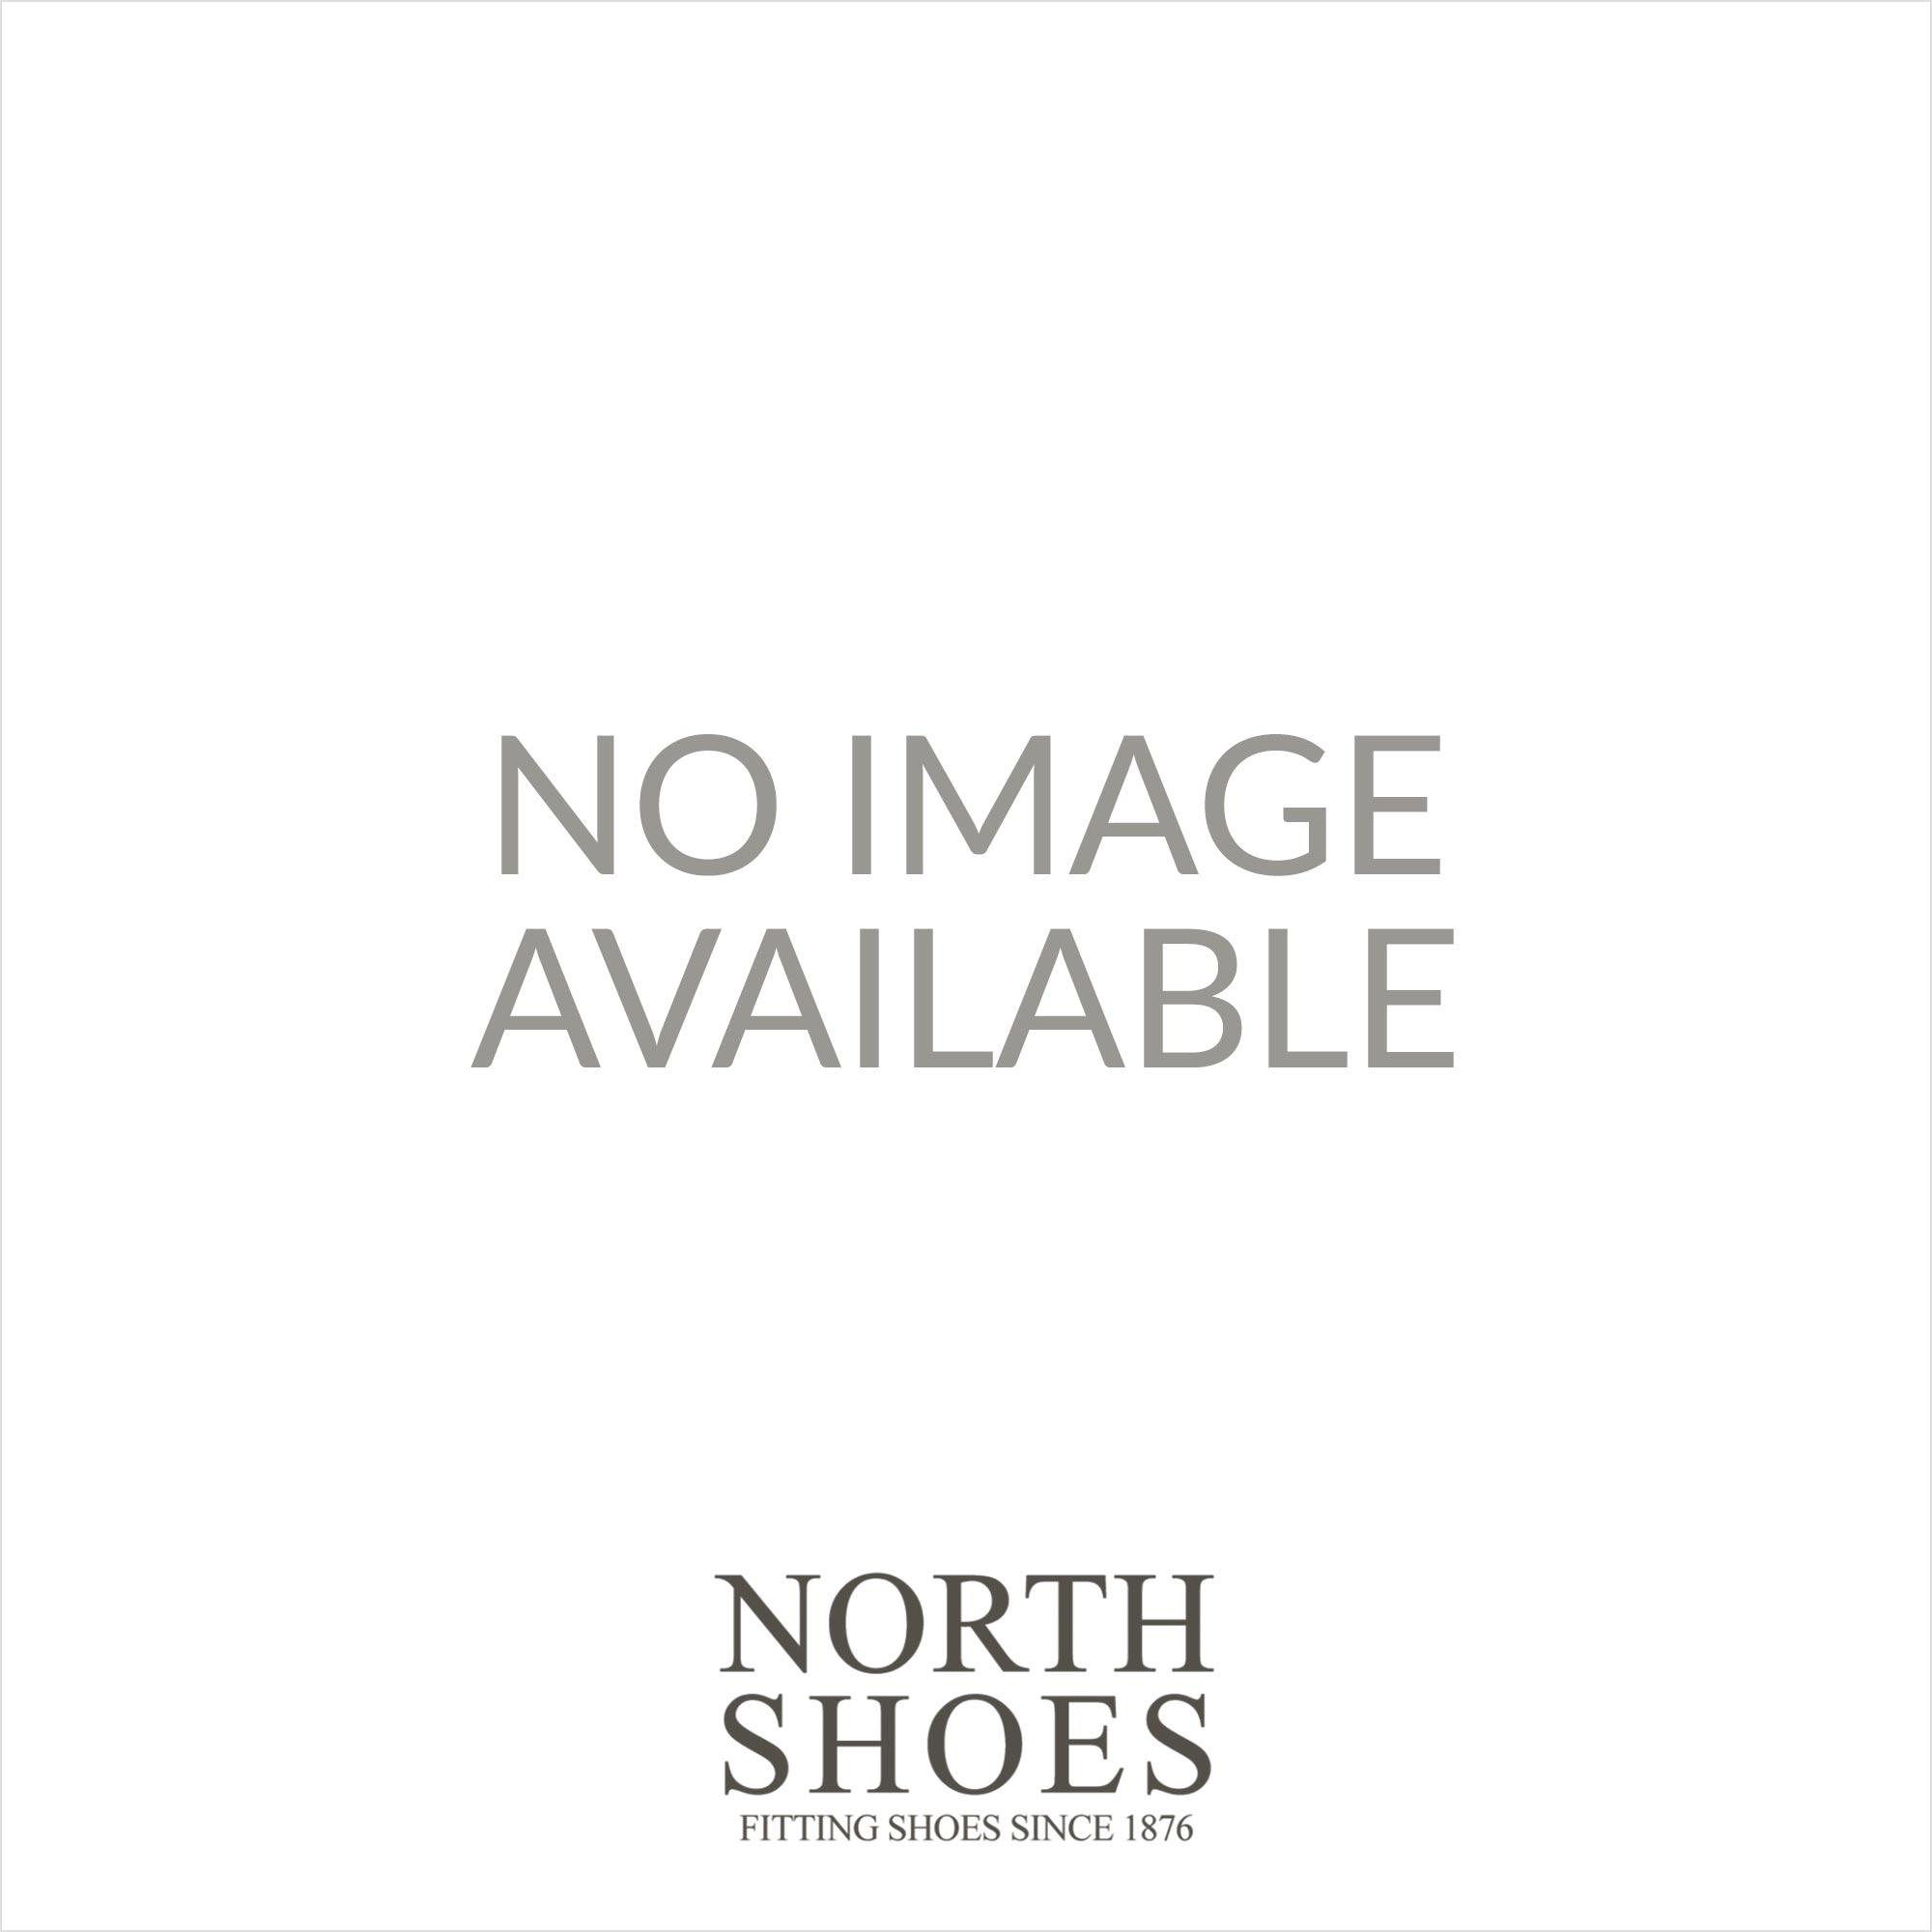 6f82e0ef2 ... Rieker Ulla M4823-45 Grey/Black Womens Lace Up Brogue Shoes - UK 7 ...